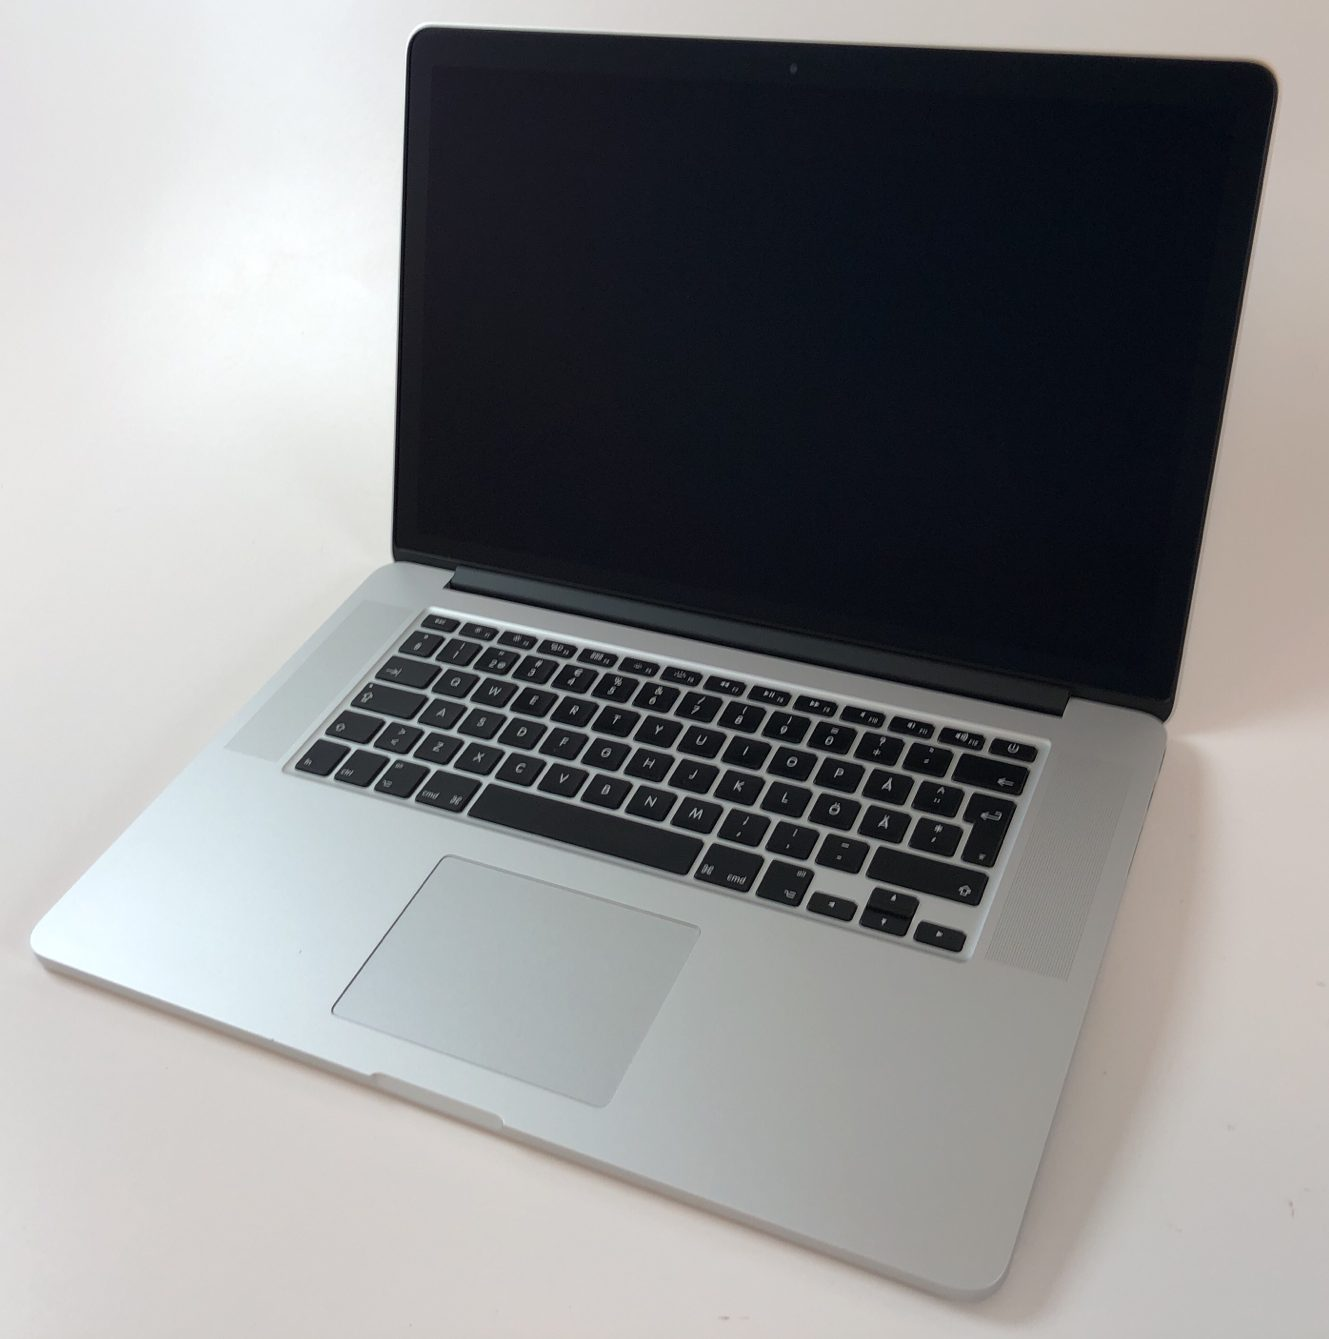 "MacBook Pro Retina 15"" Late 2013 (Intel Quad-Core i7 2.3 GHz 16 GB RAM 512 GB SSD), Intel Quad-Core i7 2.3 GHz, 16 GB RAM, 512 GB SSD, Kuva 1"